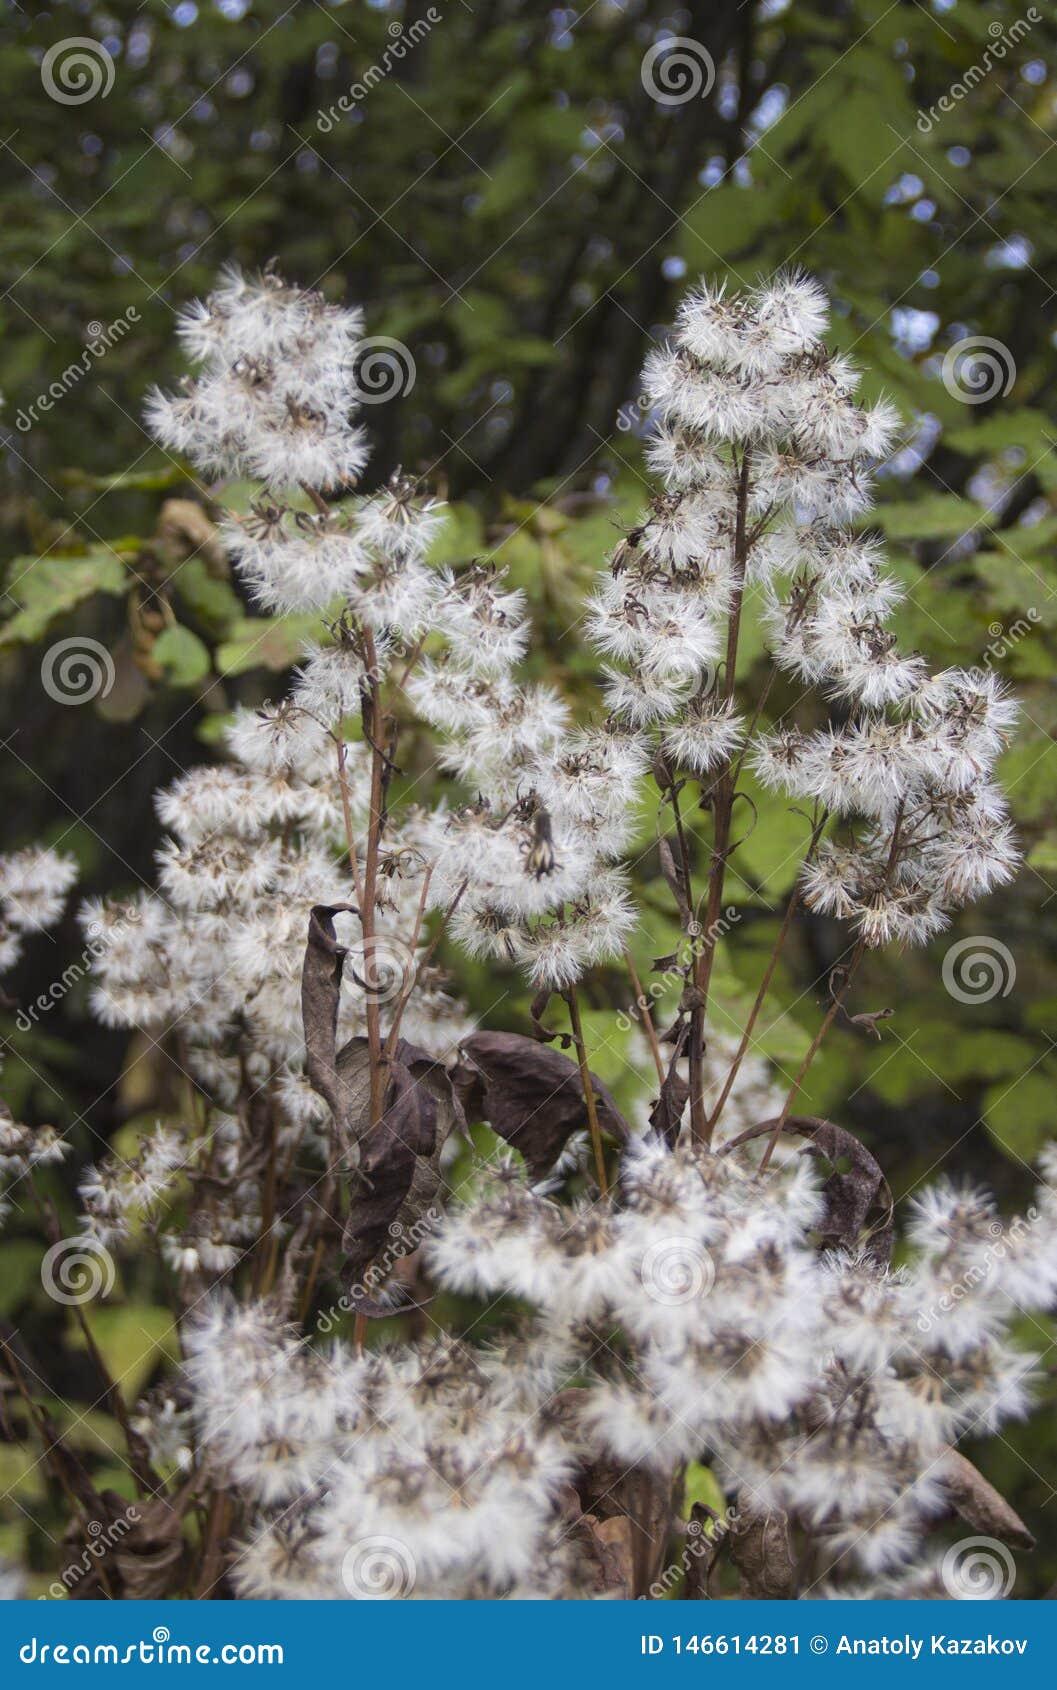 Perennial herbaceous plant